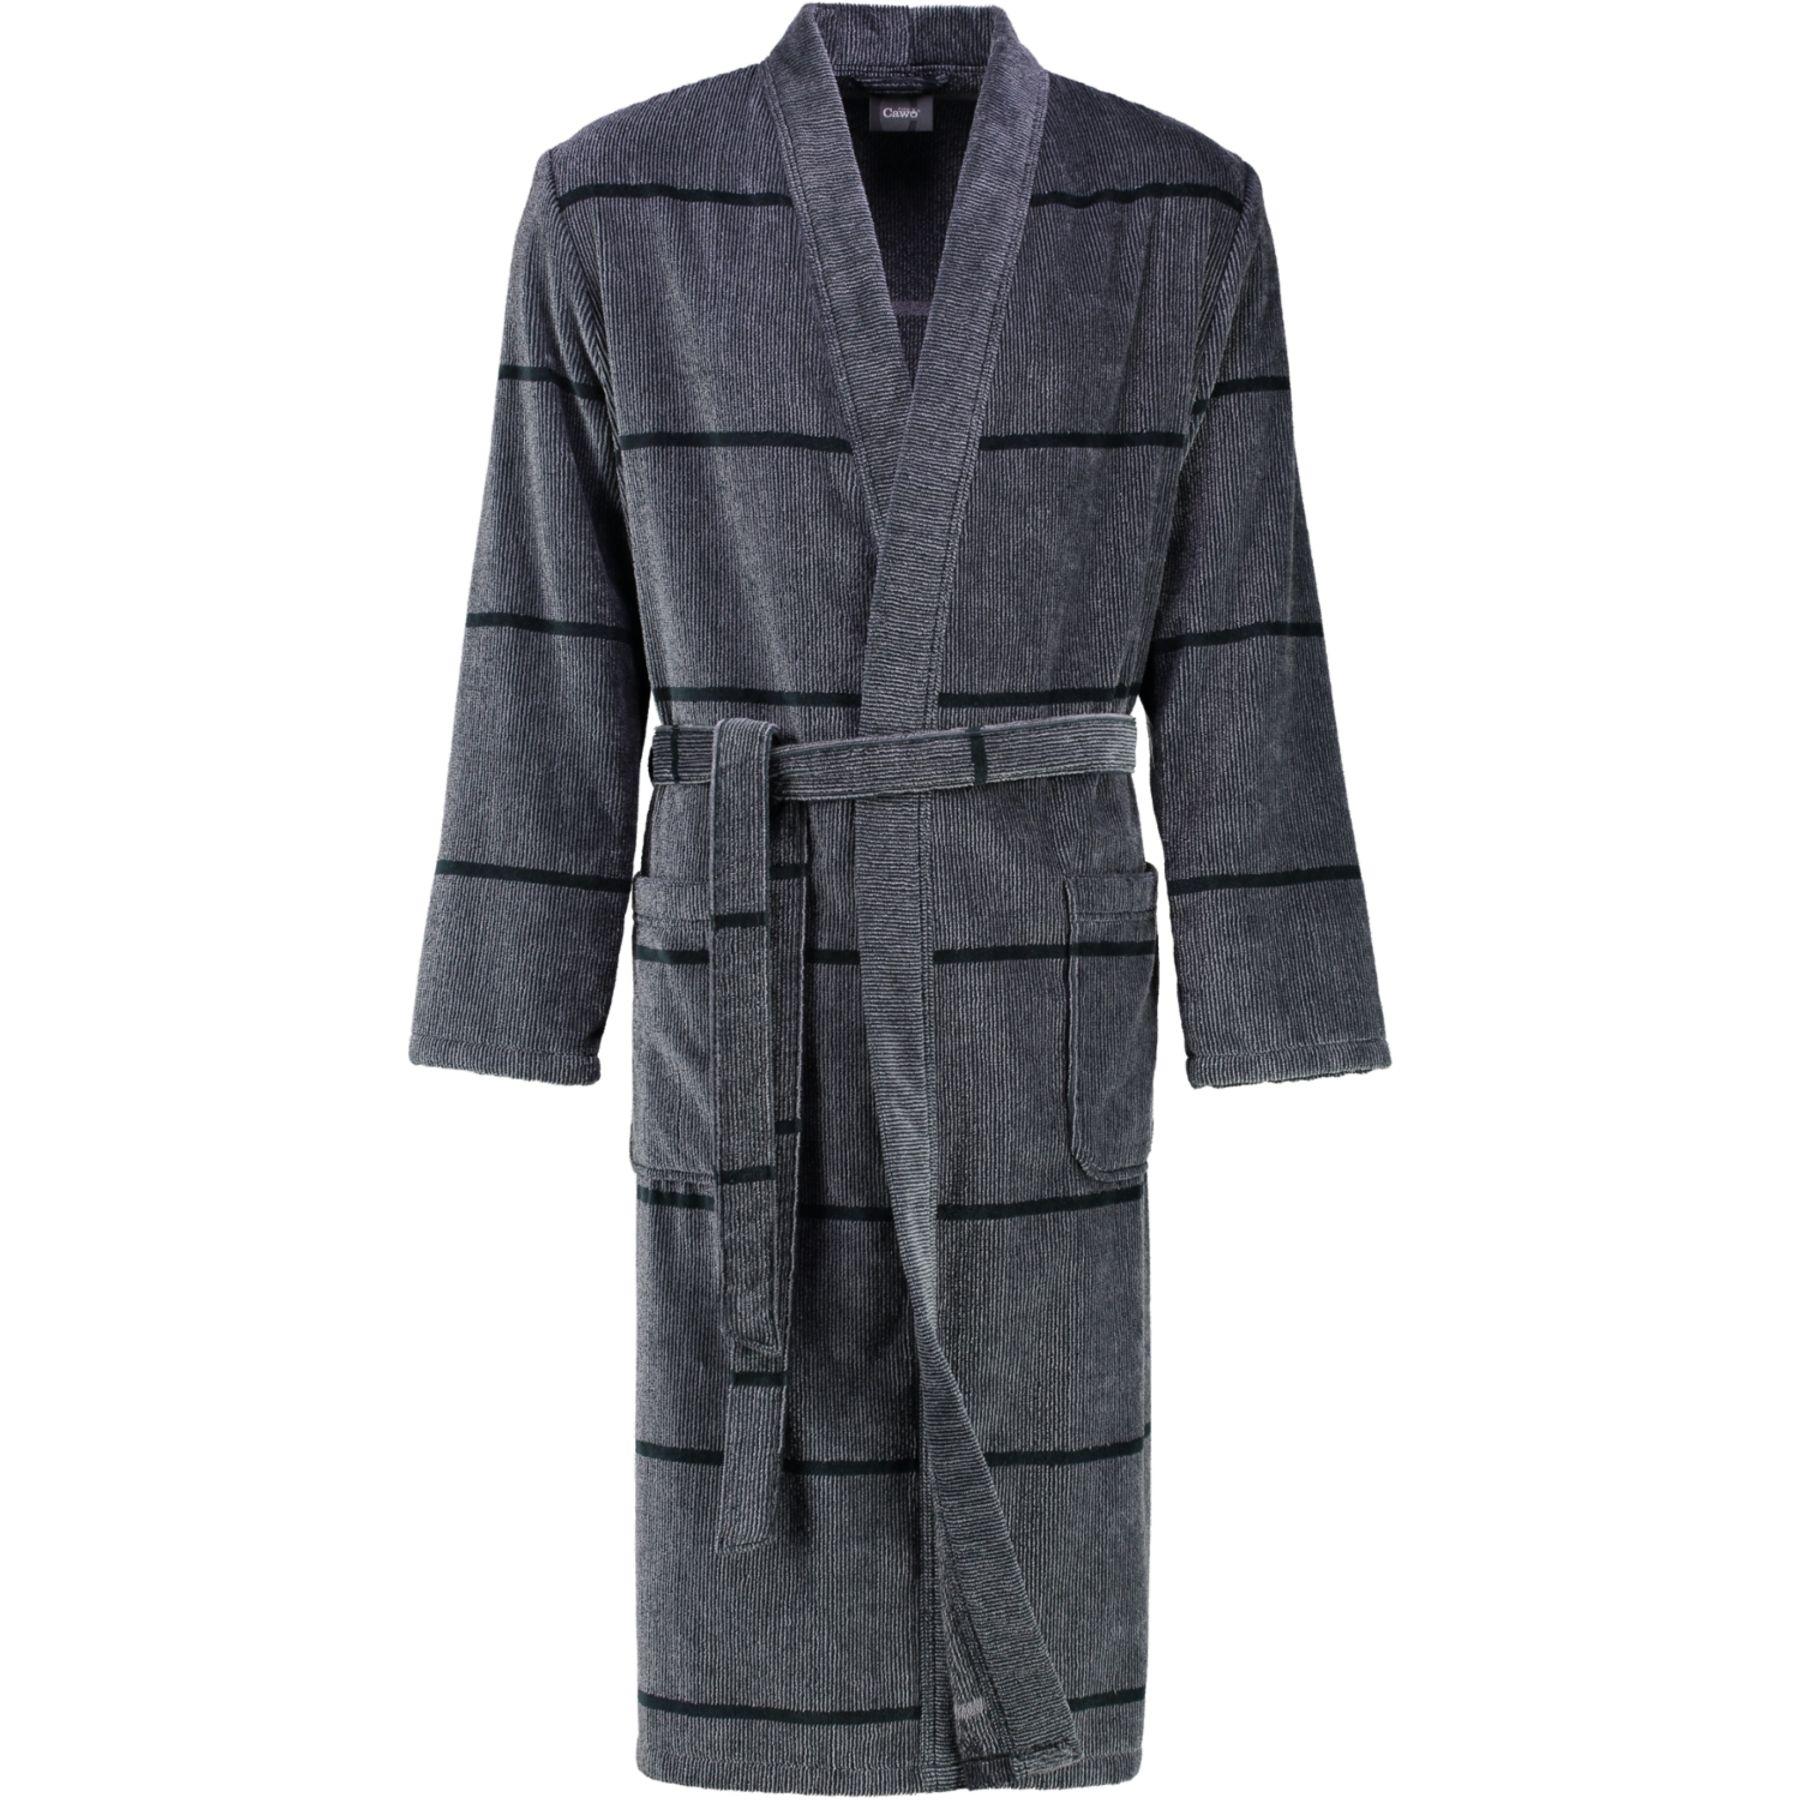 Cawö - Herren Walkvelours Bademantel Kimono (2847) – Bild 3